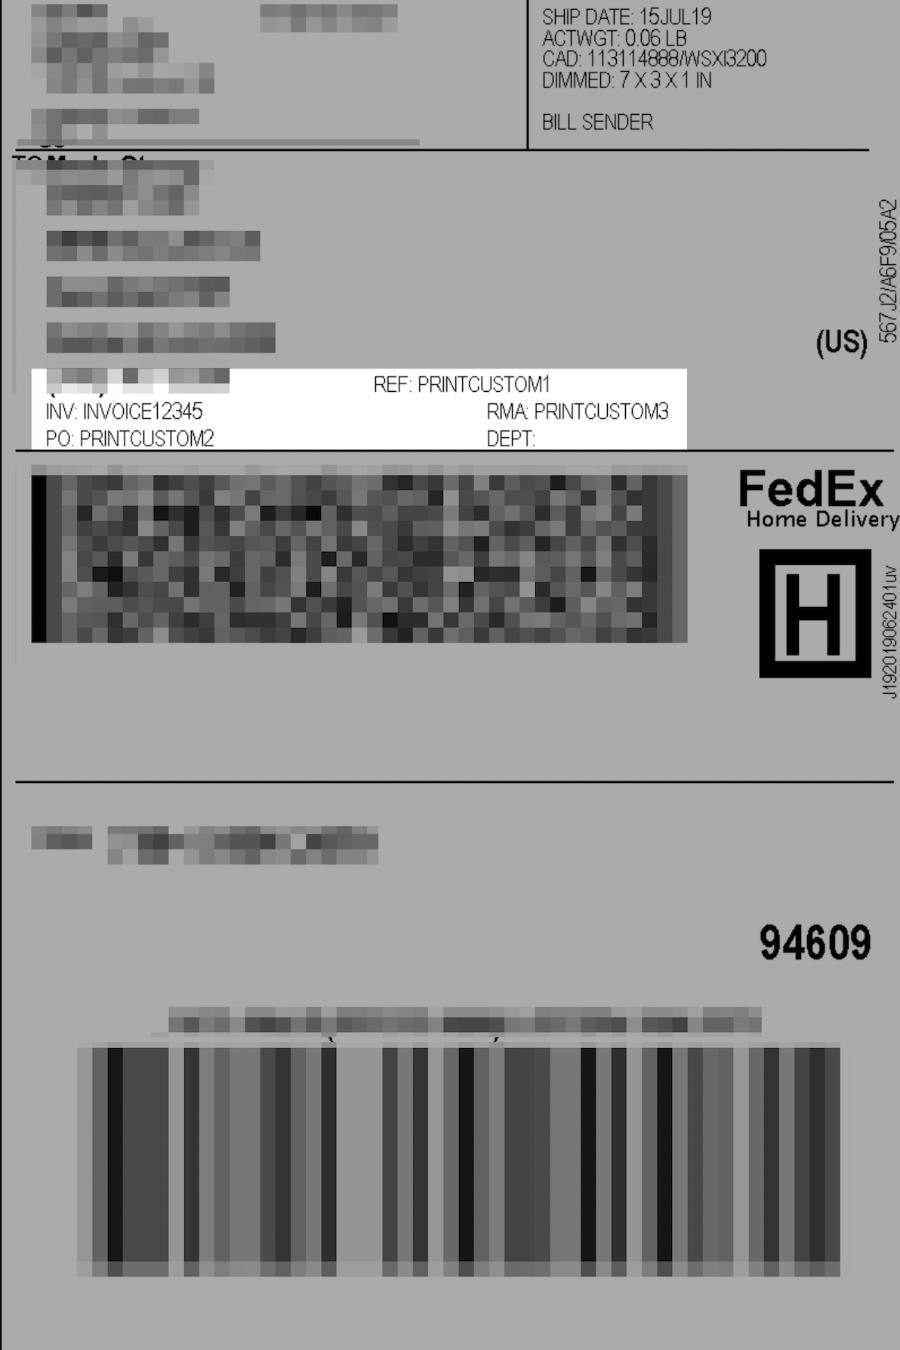 FedEx label custom text options